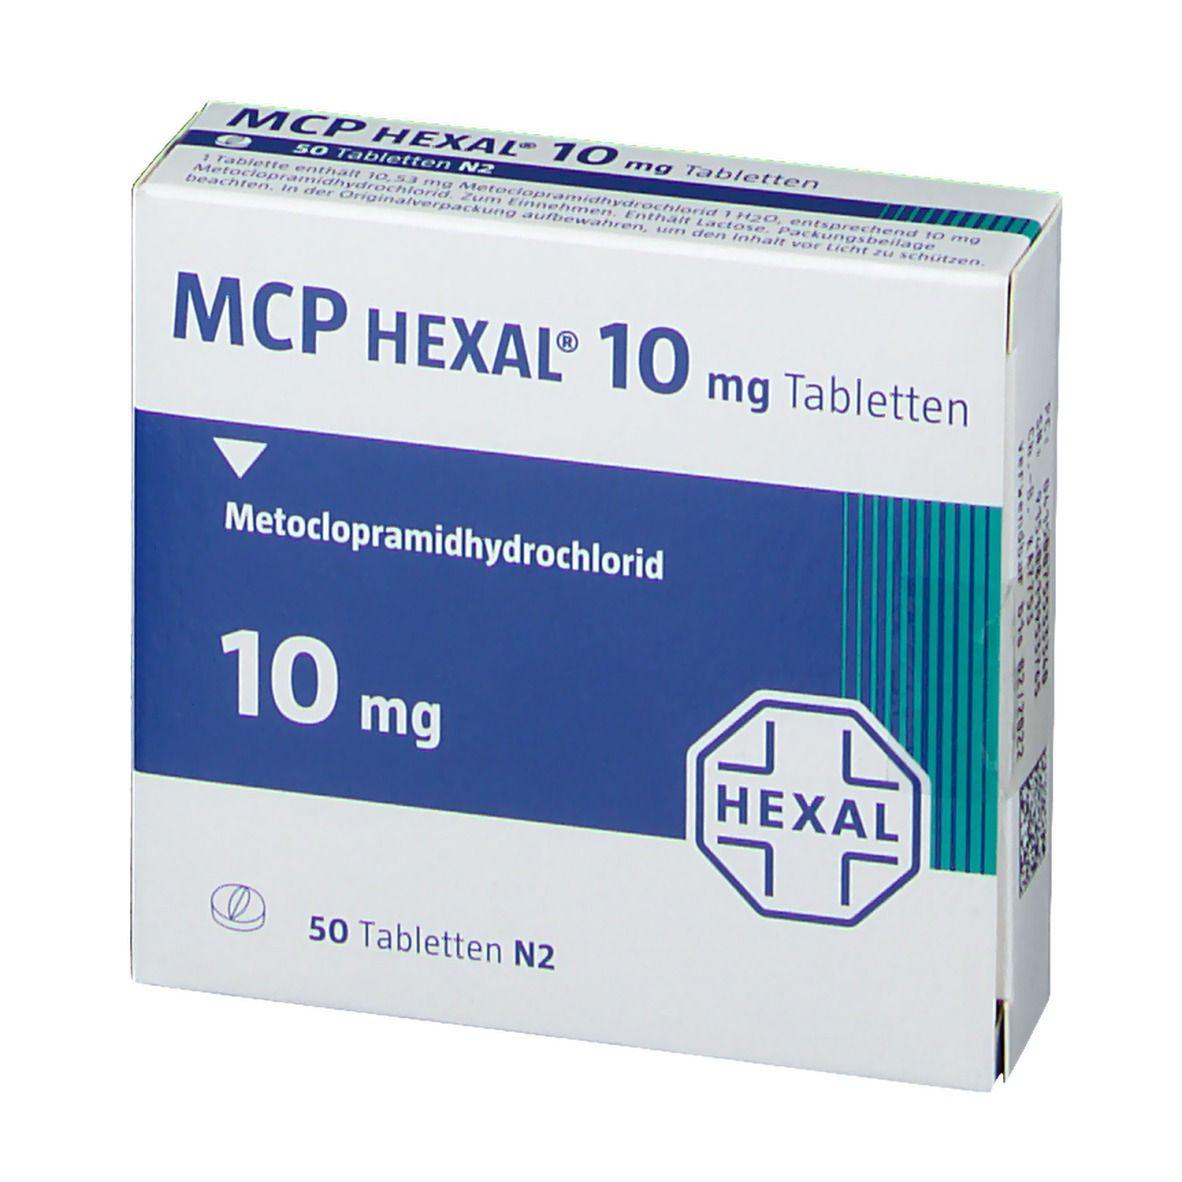 Mcp Hexal 10 Tabletten